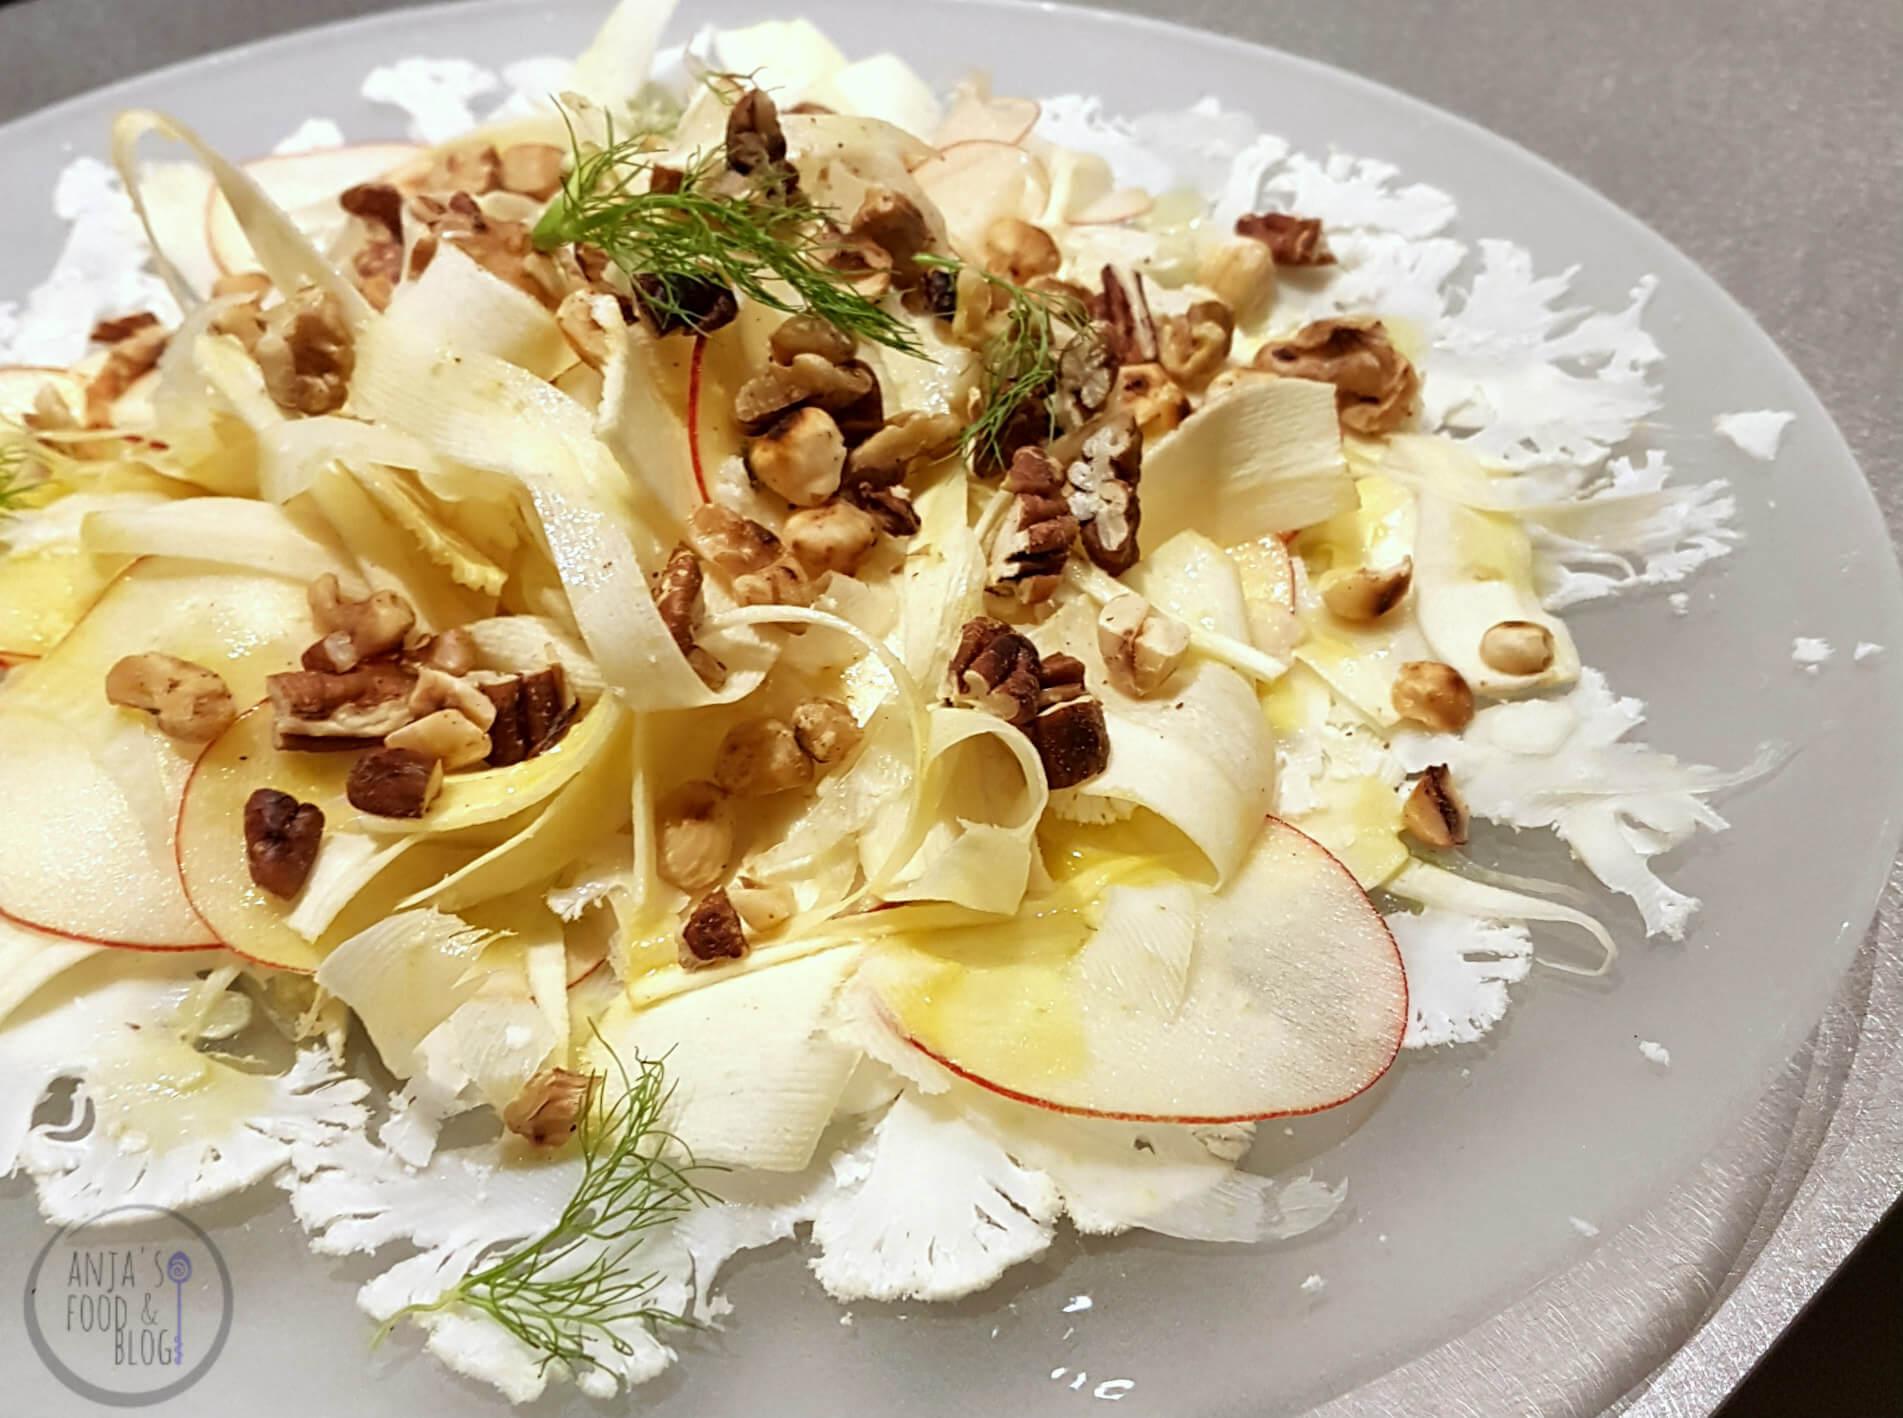 Salade van bloemkool, venkel en pastinaak